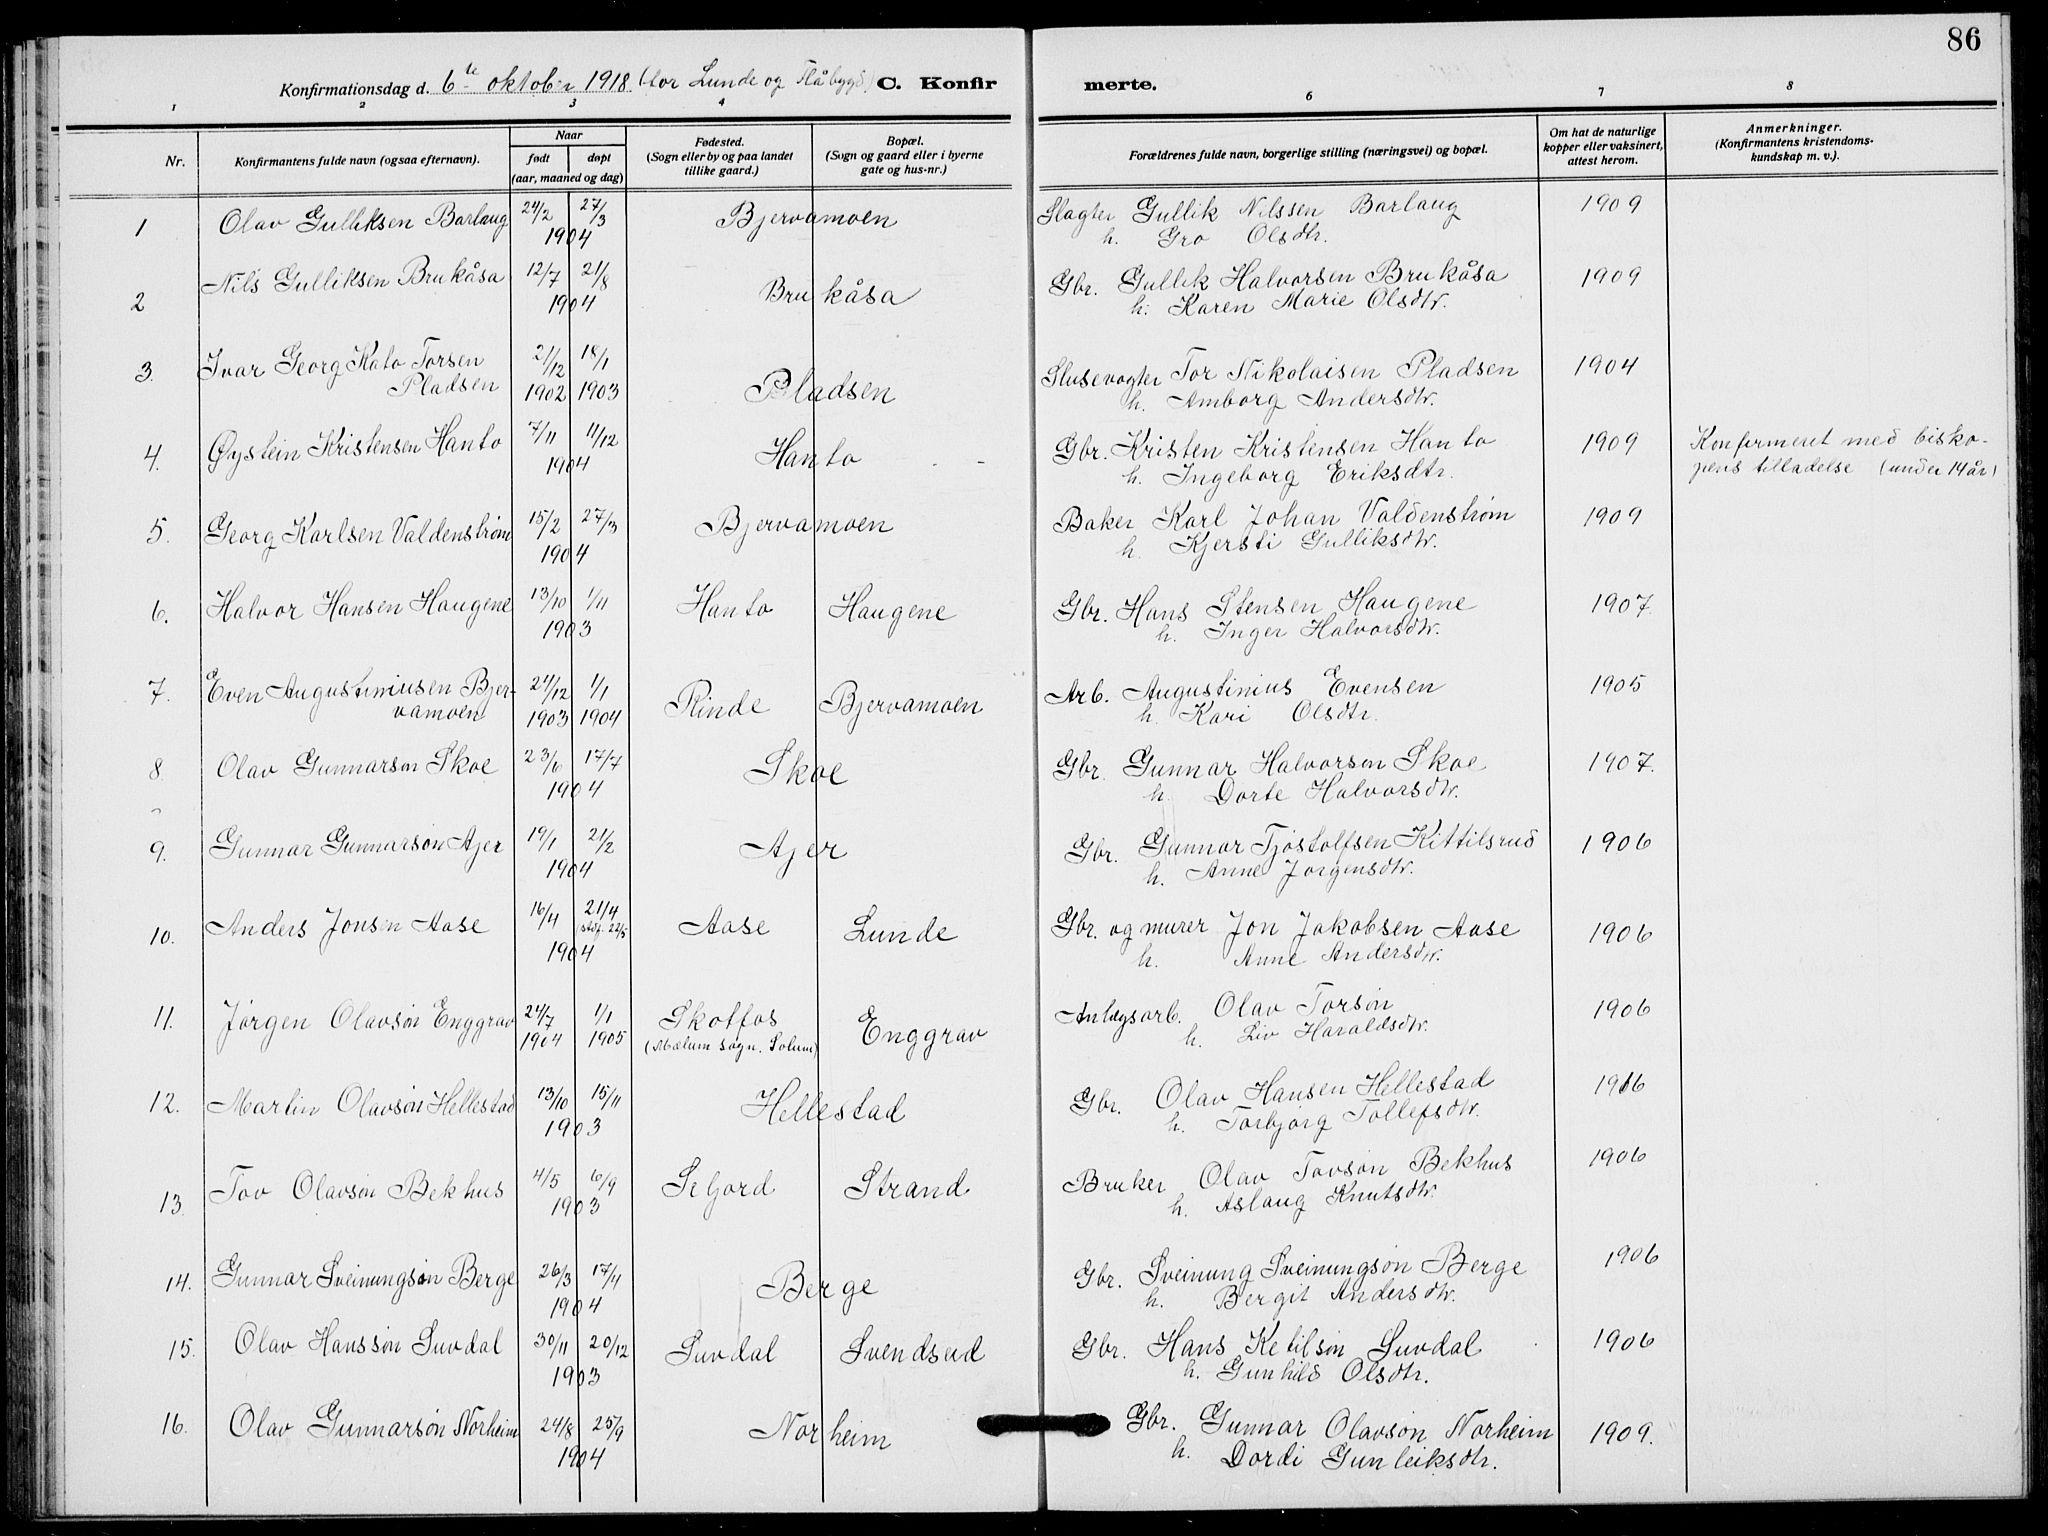 SAKO, Lunde kirkebøker, F/Fa/L0005: Ministerialbok nr. I 5, 1914-1922, s. 86